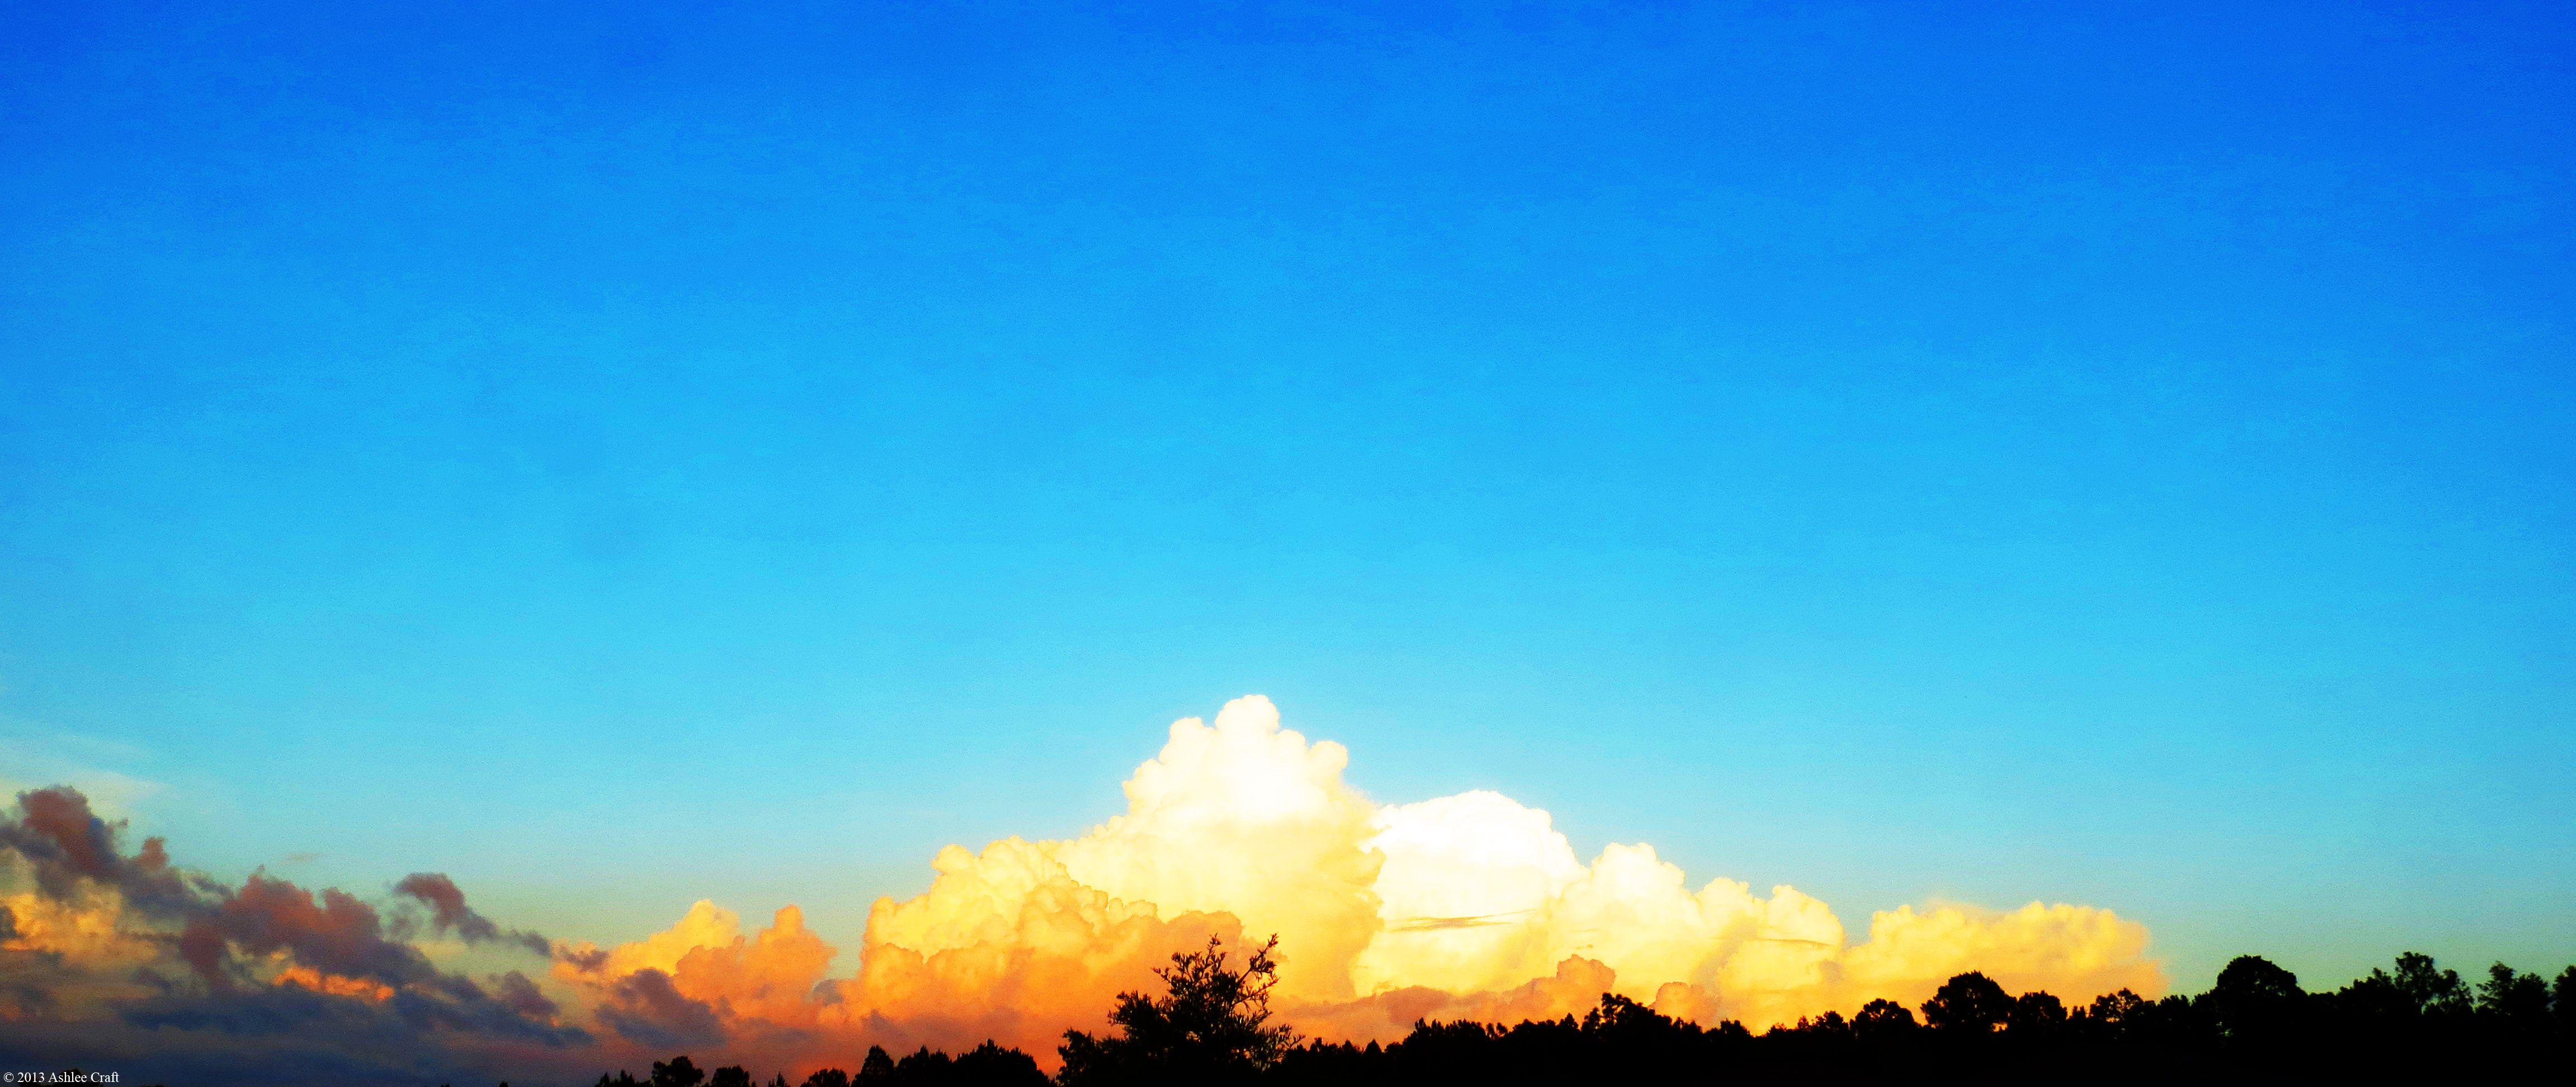 Clouds Landscape By Ashlee Craft Nature Sky Landscapes Cloud Sunset Clouds Nature Landscape